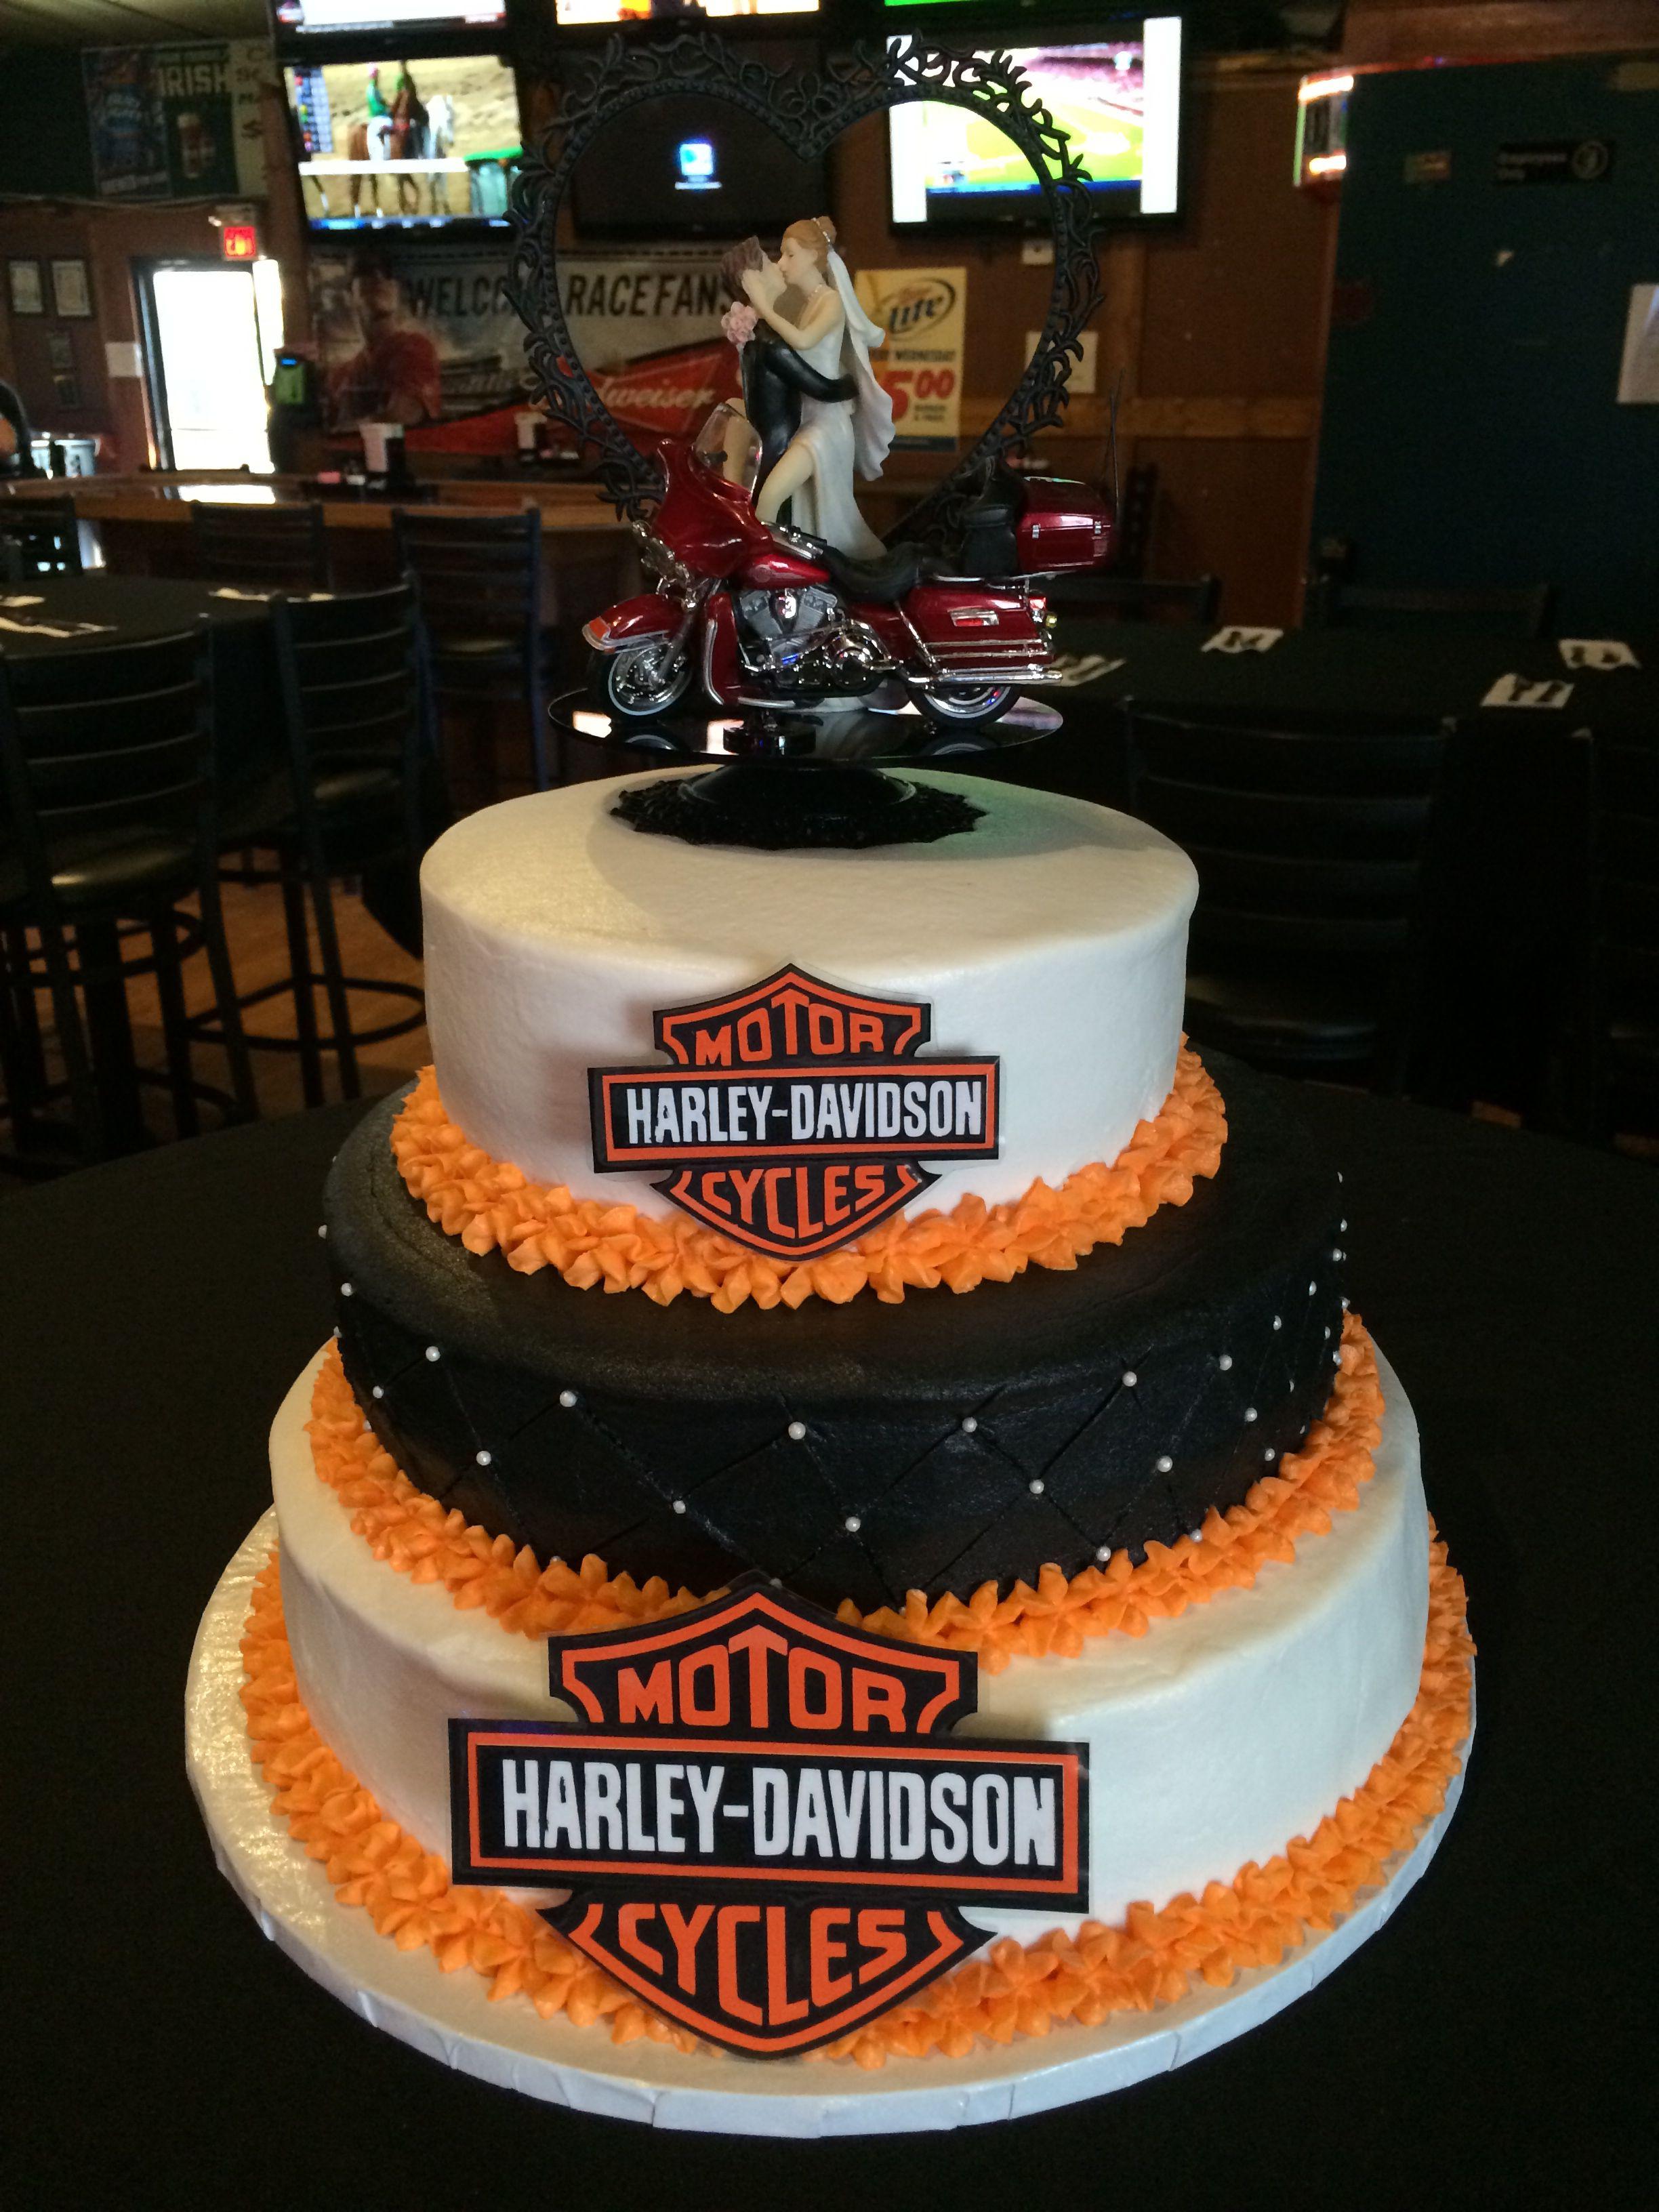 Harley Davidson wedding cake | Wedding Ideas | Pinterest | Harley ...